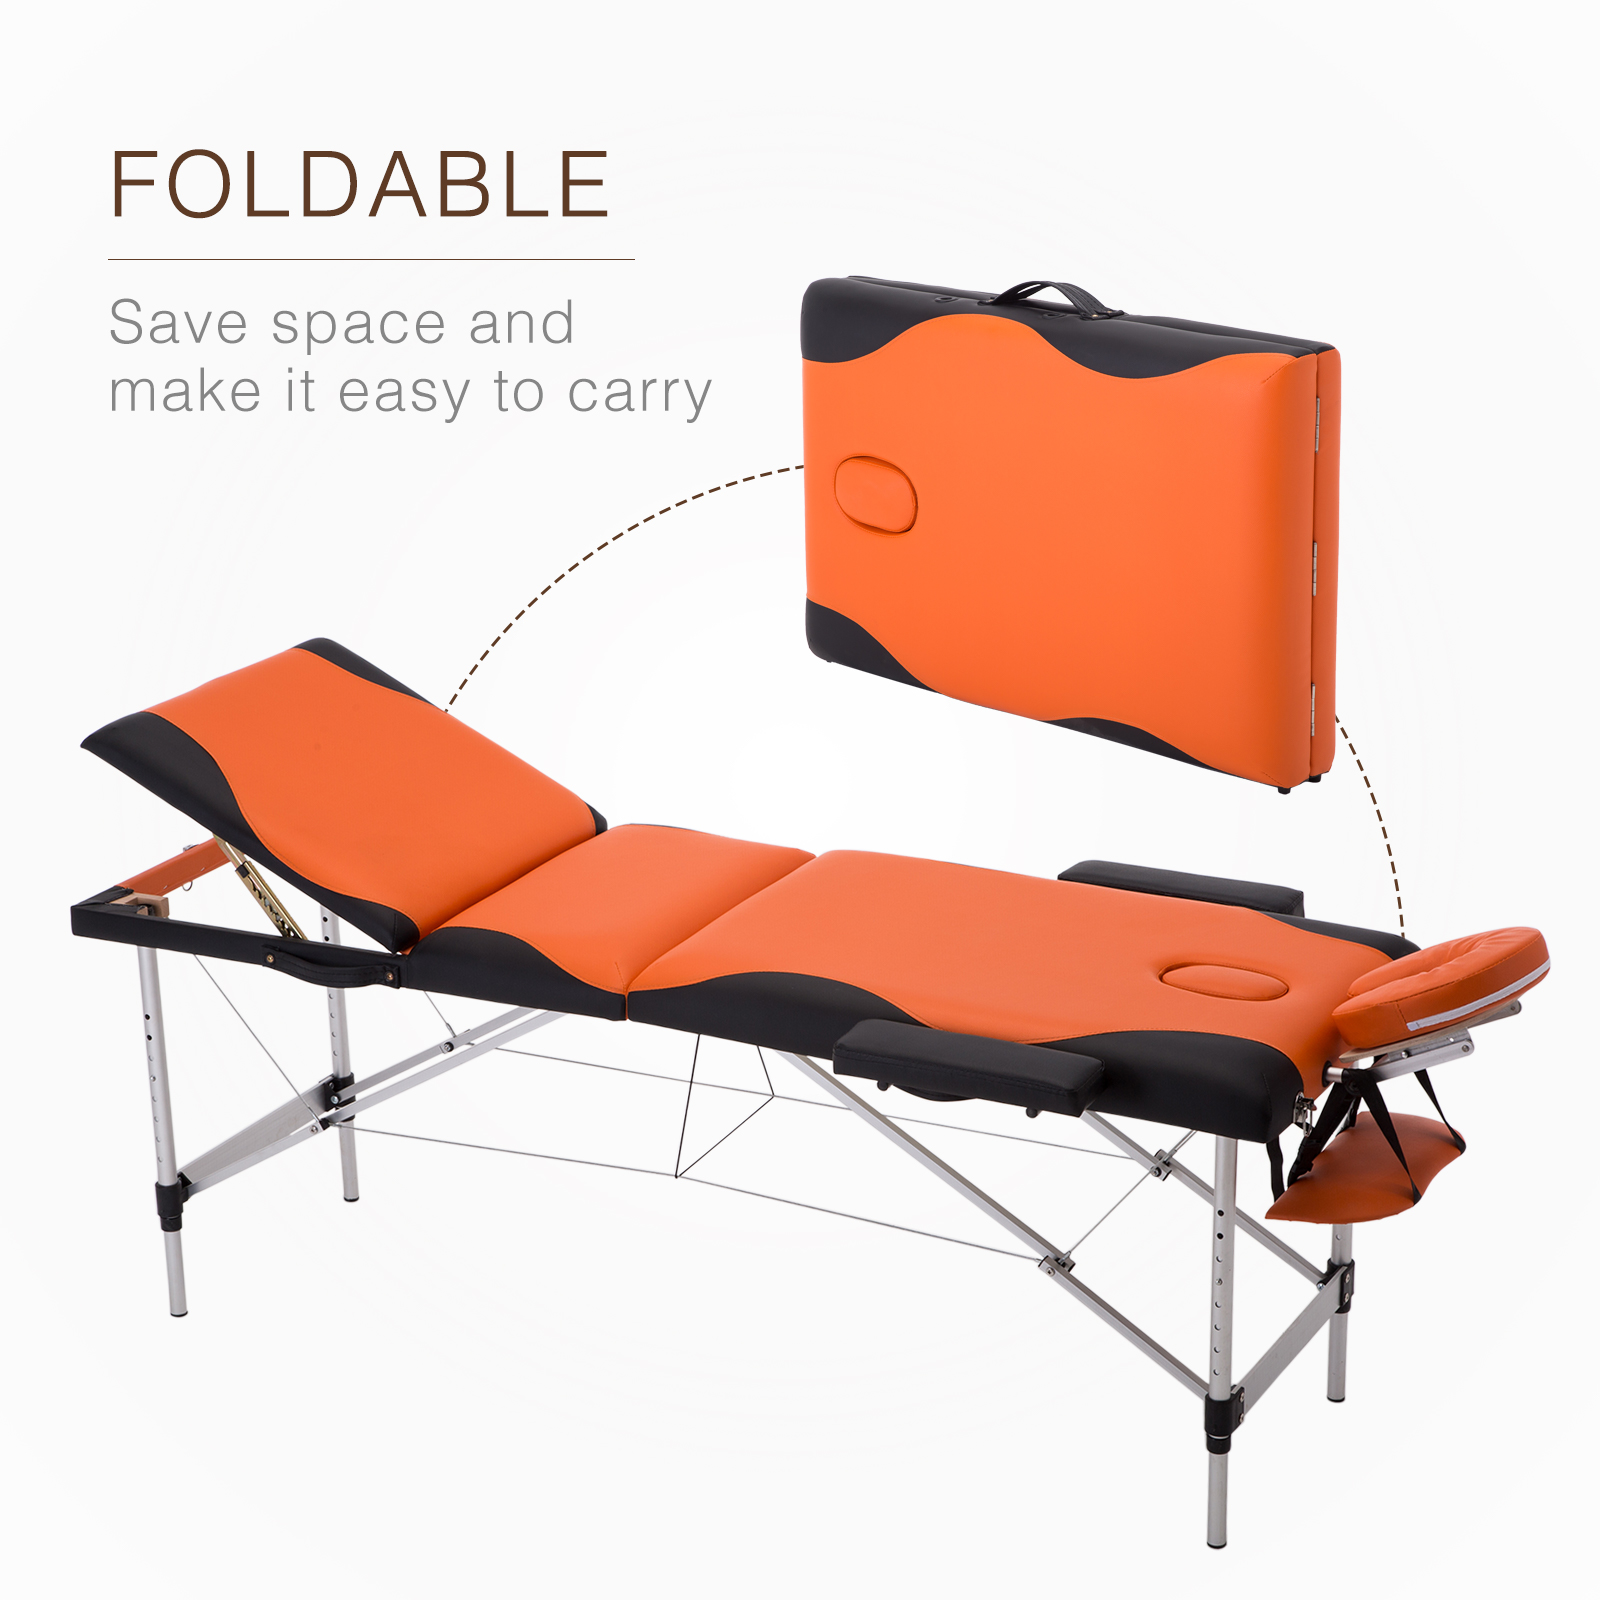 mecor portable massage table 3 fold facial spa bed w free carry case aluminum walmart com